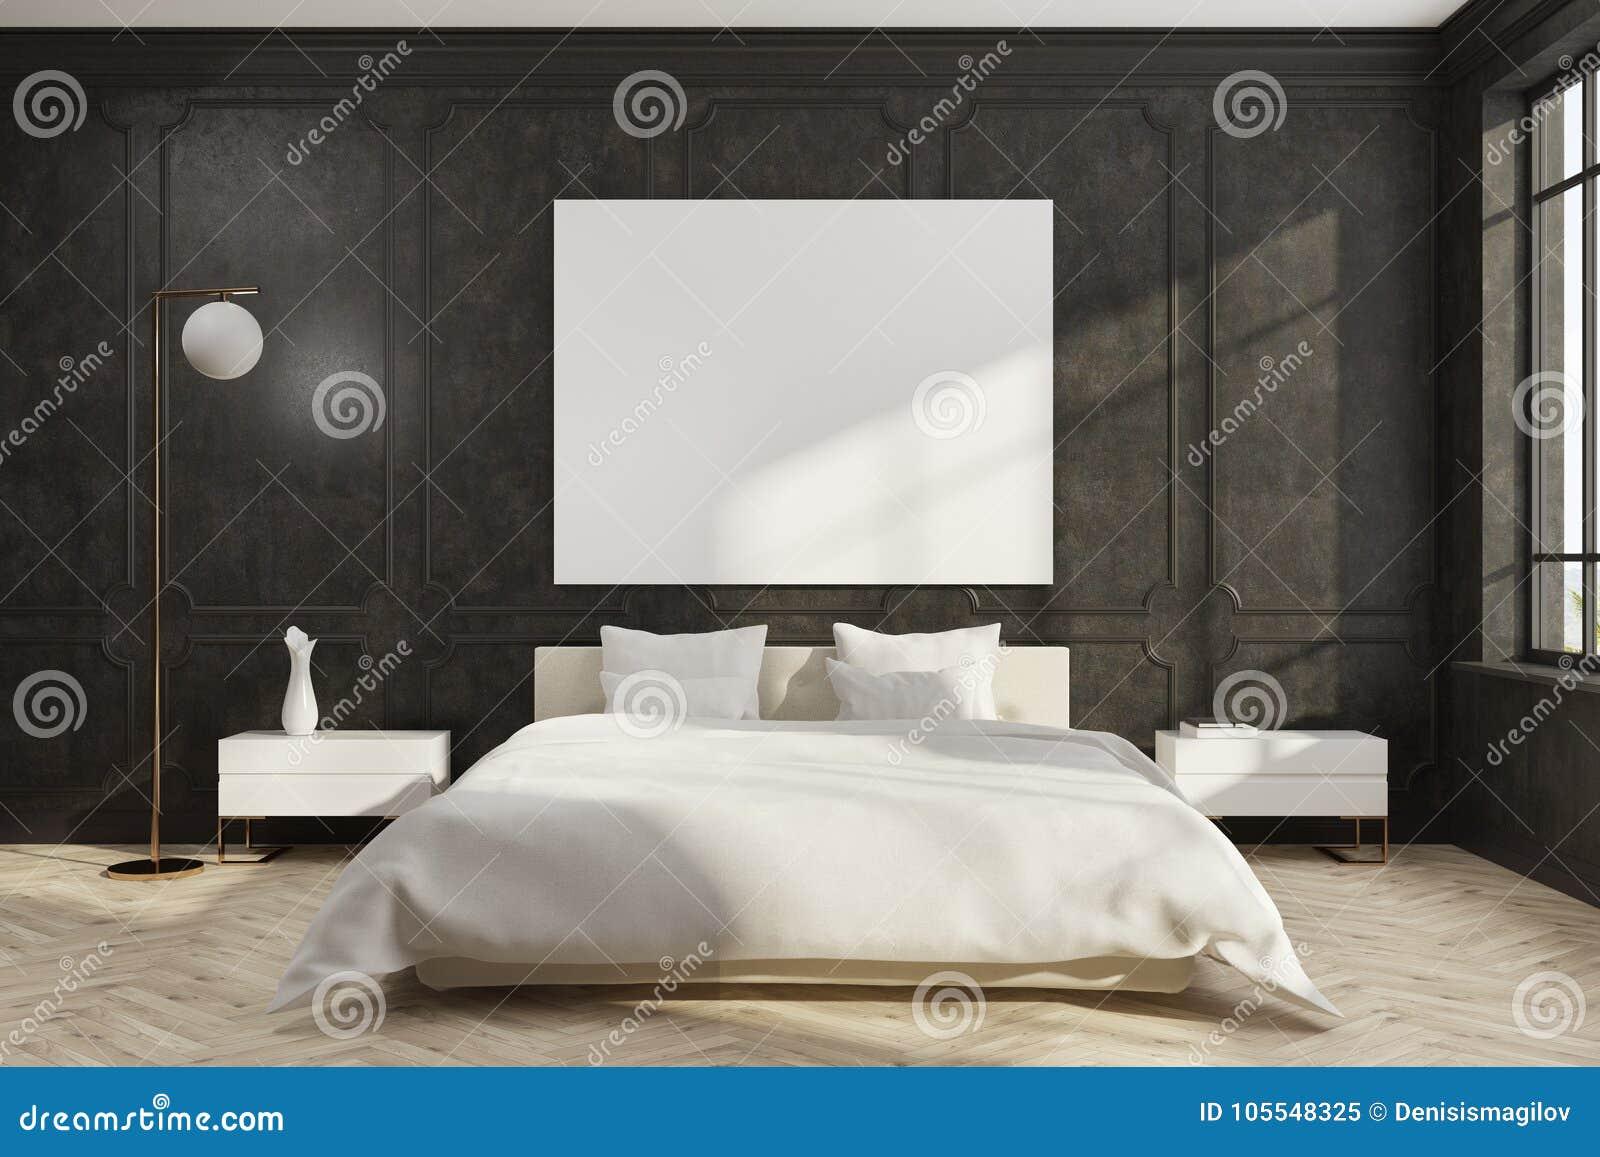 Black Bedroom White Bed Poster Stock Illustration Illustration Of Poster Hipster 105548325